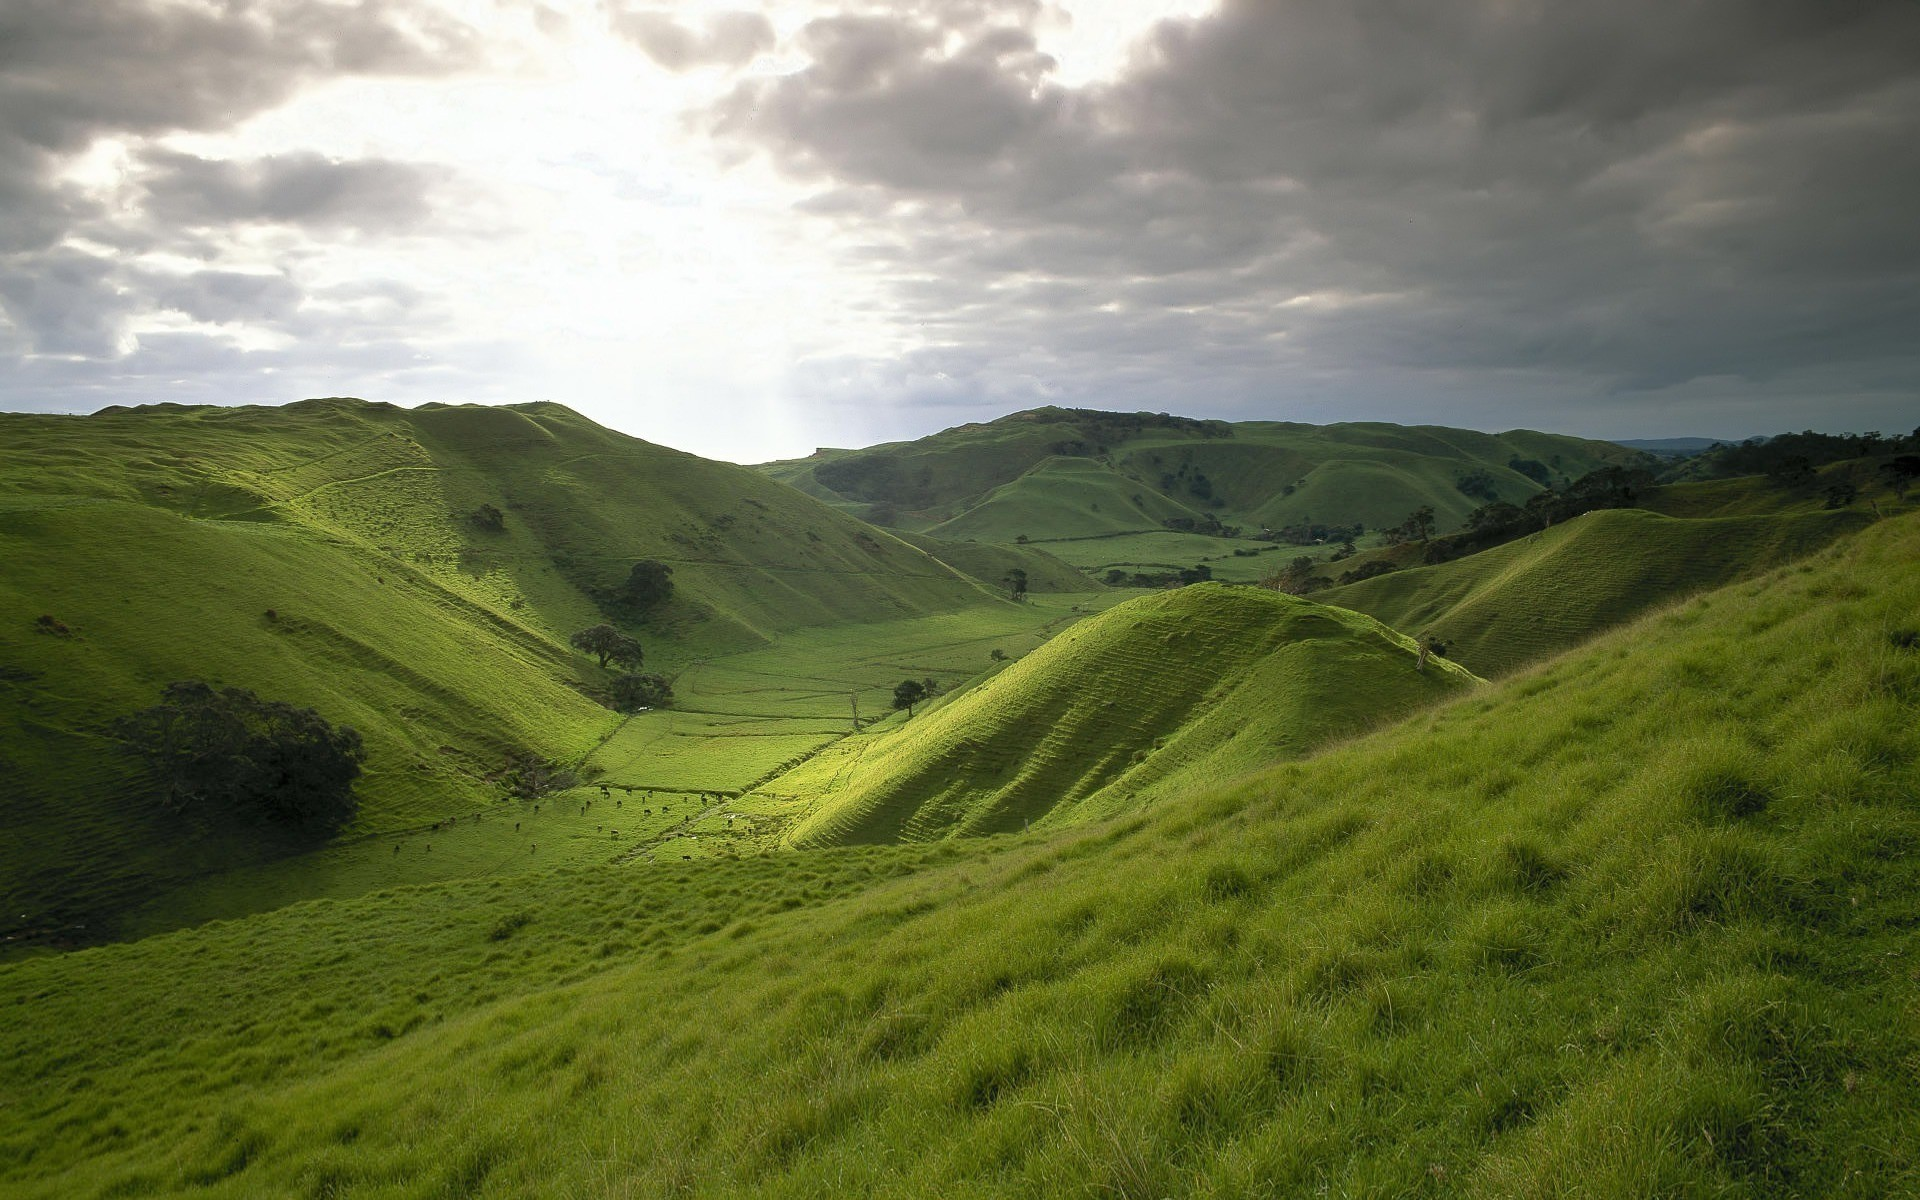 General 1920x1200 landscape hills field